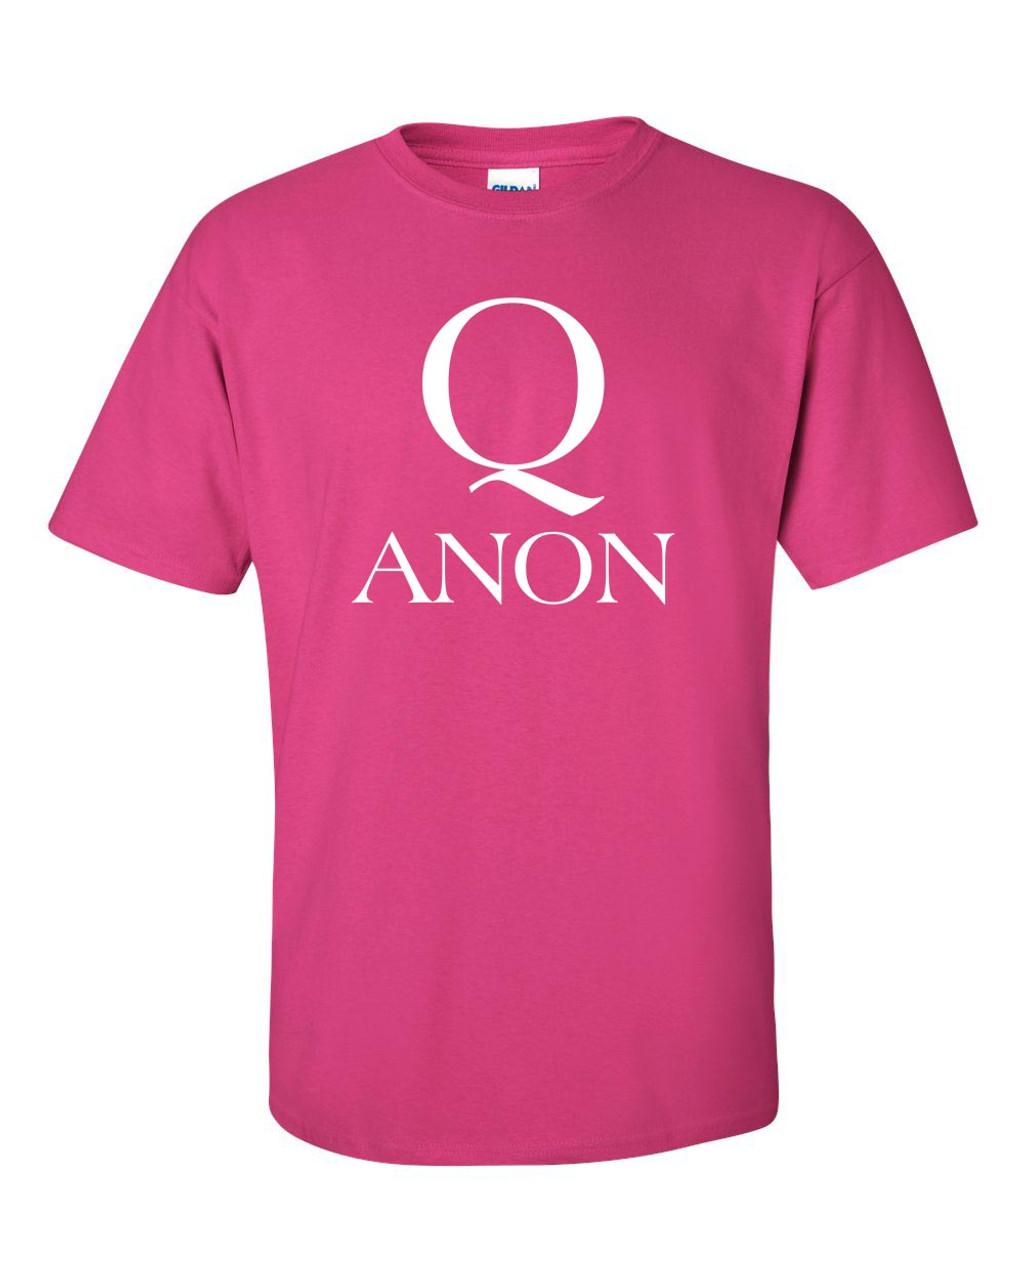 Q WWG1WGA The Great Awakening Women/'s V-Neck T-Shirt Q Anon MAGA Trump Hair